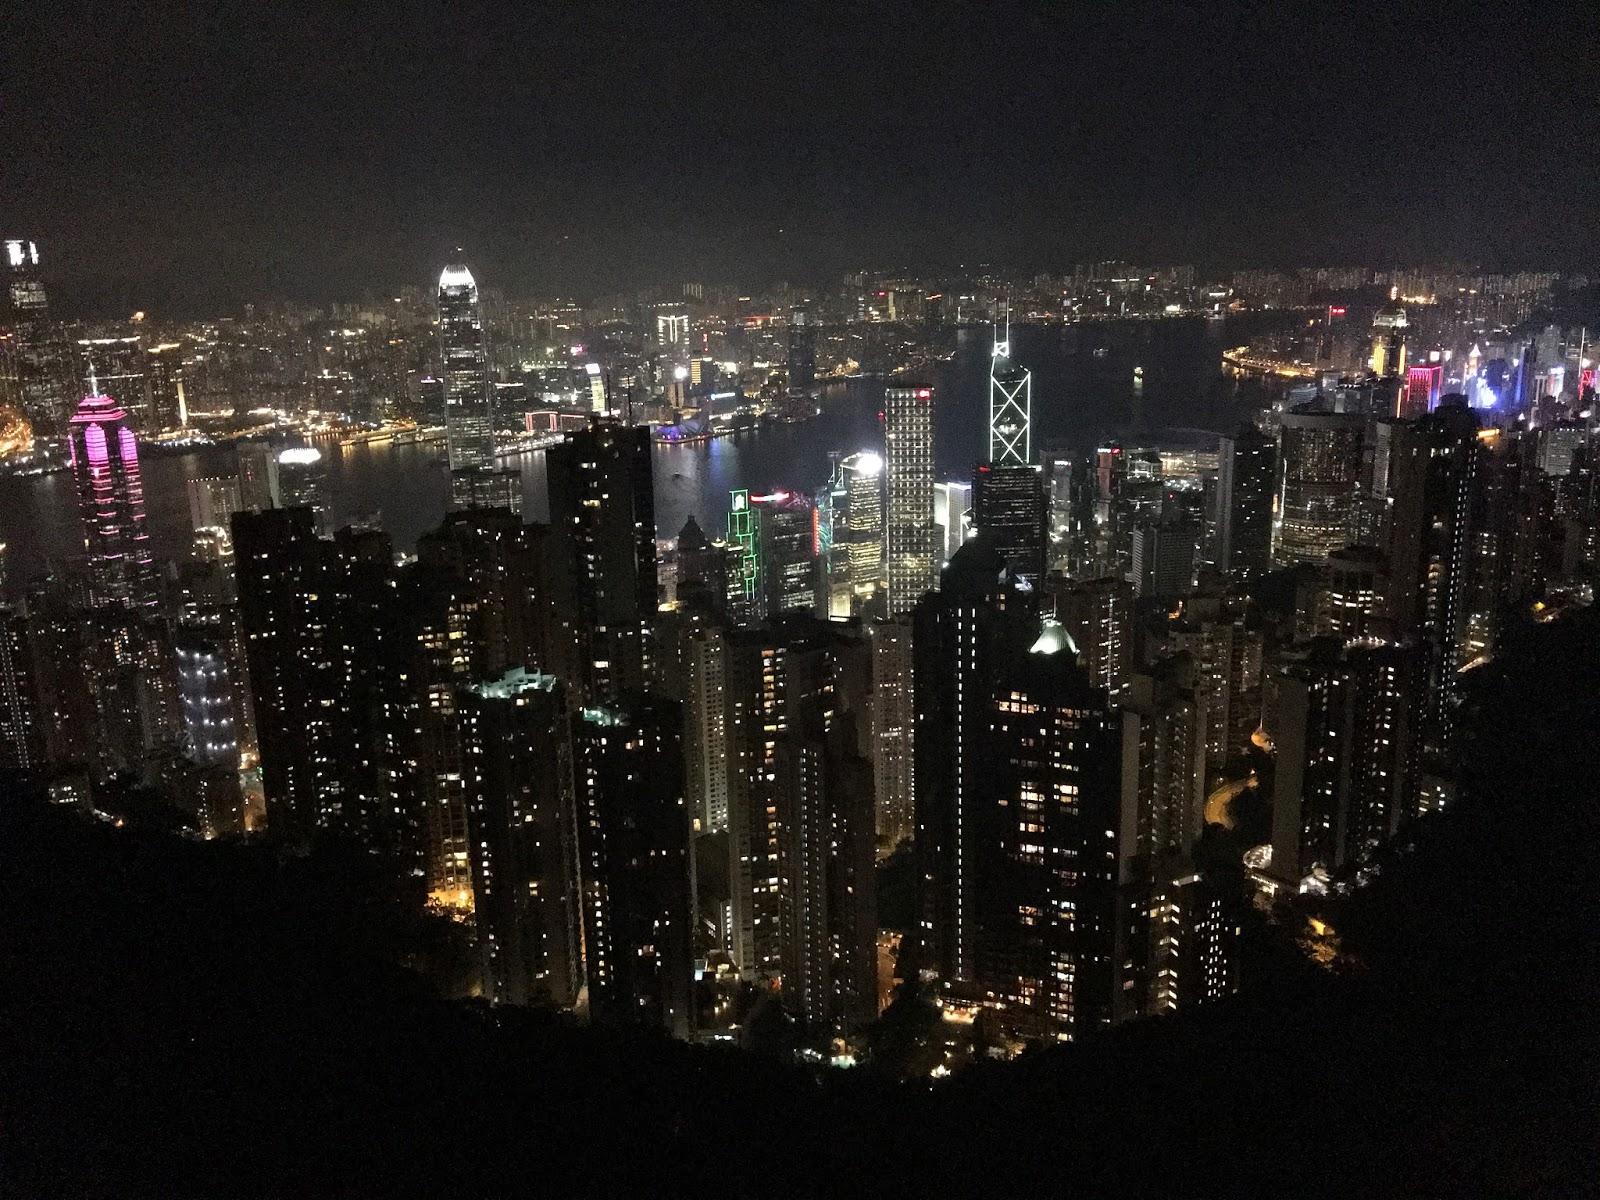 Victoria Peak Sky Lounge 428 Hong Kong Skyline View - Aspiring Londoner